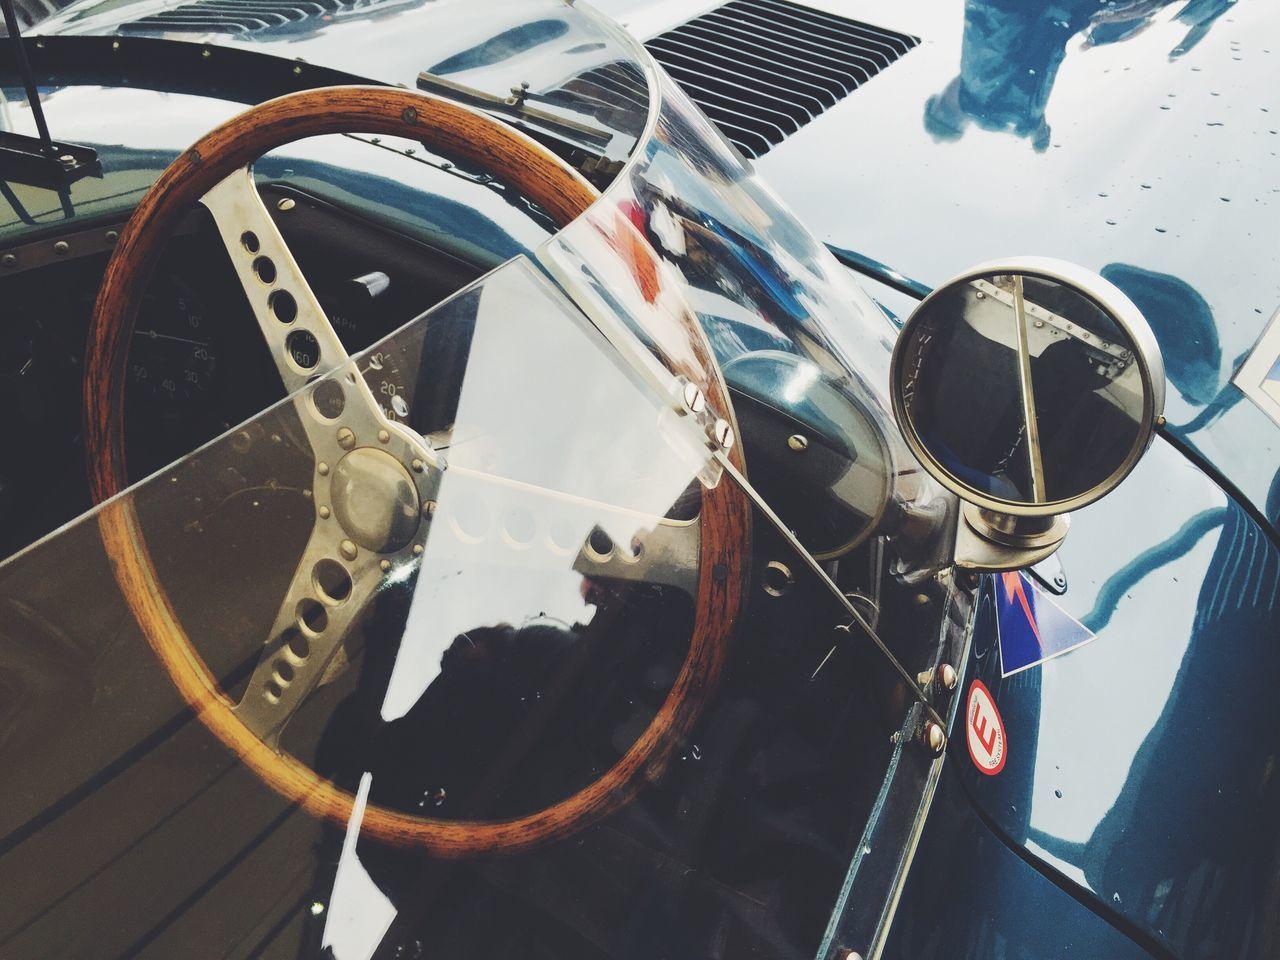 Ecurie Ecosse D-Type Jaguar detail Focus On Foreground No People Vehicle Hood racecar Jaguar D-type Motorsport Steering Wheel Cockpit Blue wing mirror Goodwood Revival 2016 Vintage Classic Car Well Loved Valuable Reflection Race racing